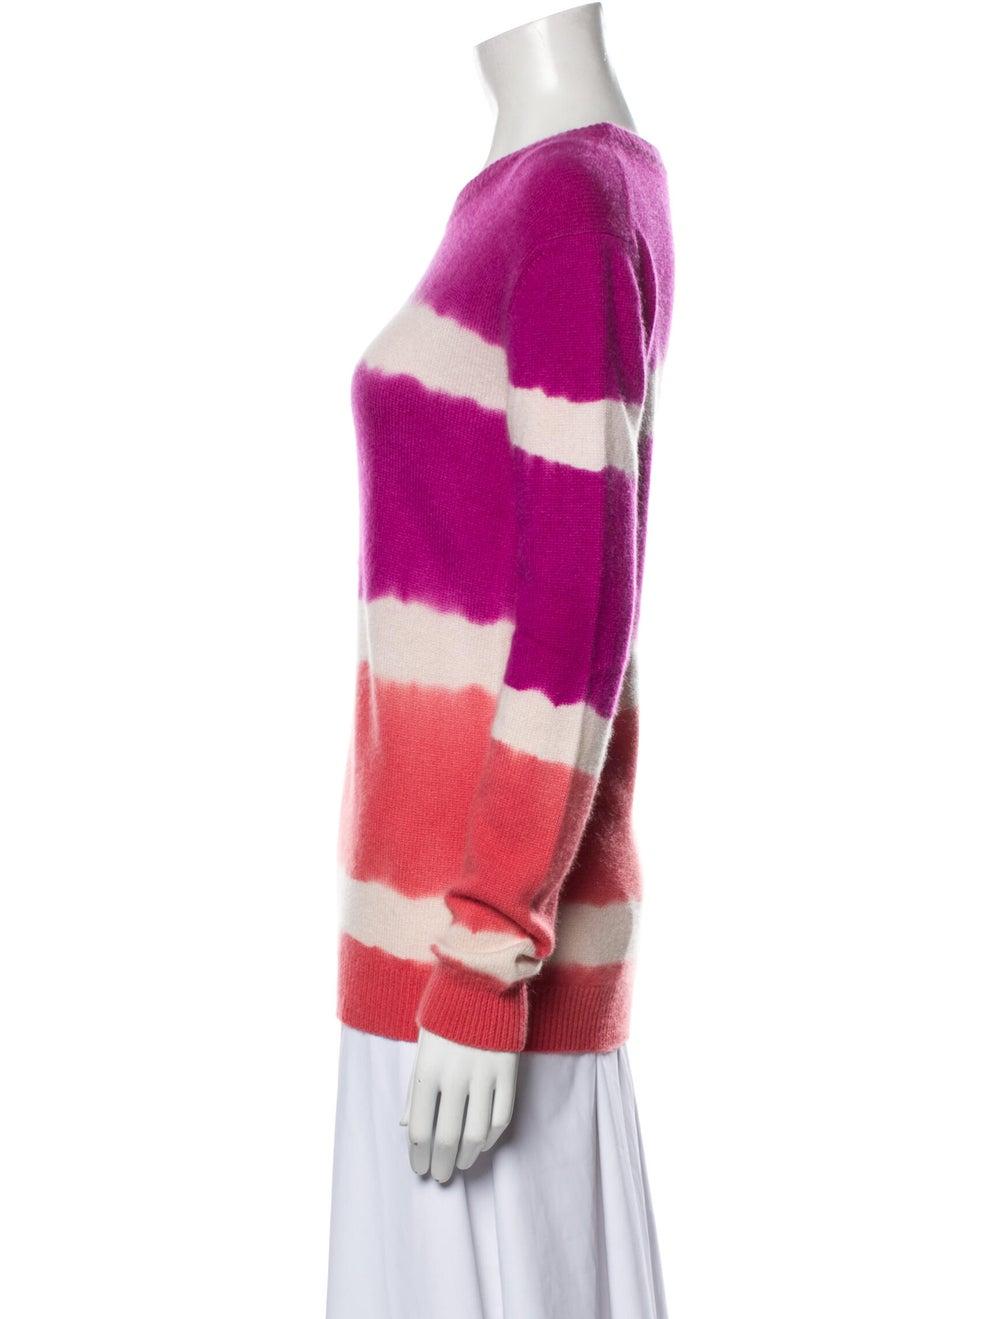 Prabal Gurung Cashmere Tie-Dye Print Sweater Purp… - image 2